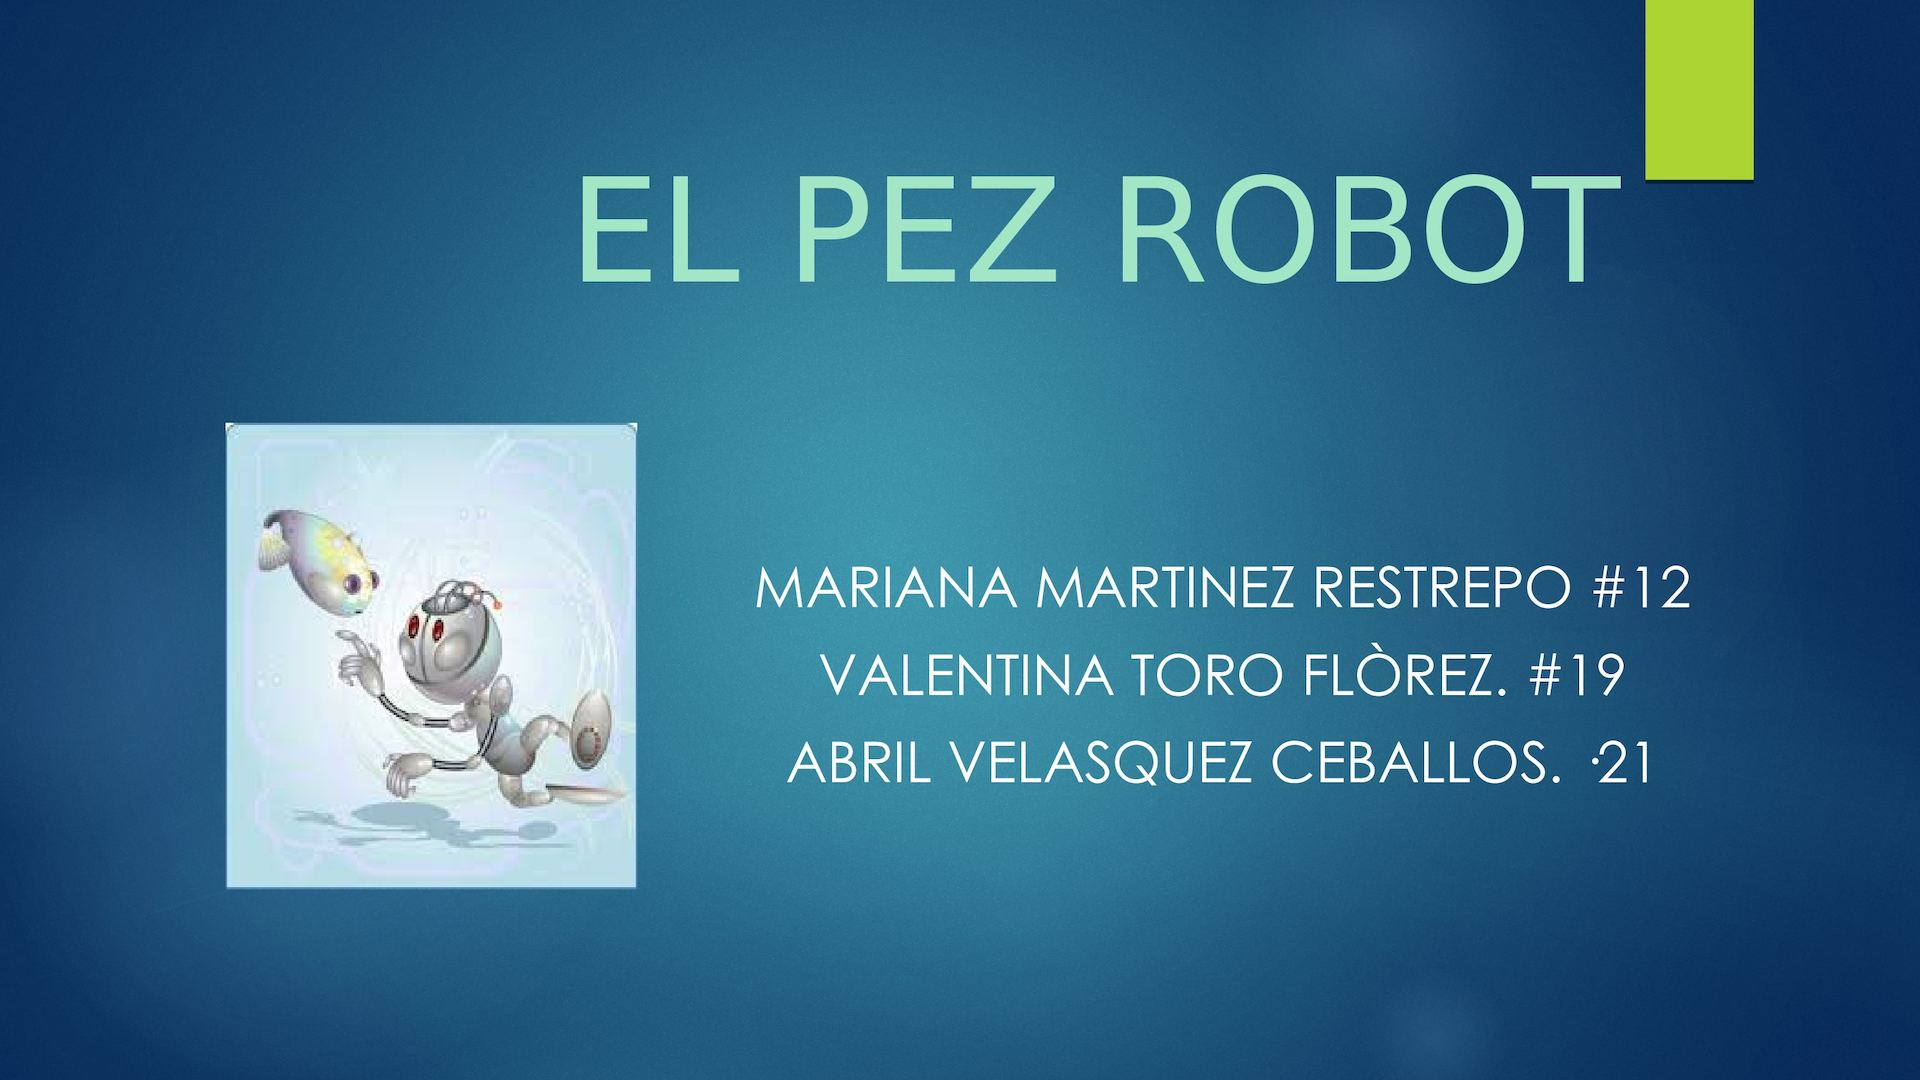 EL PEZ ROBOT.